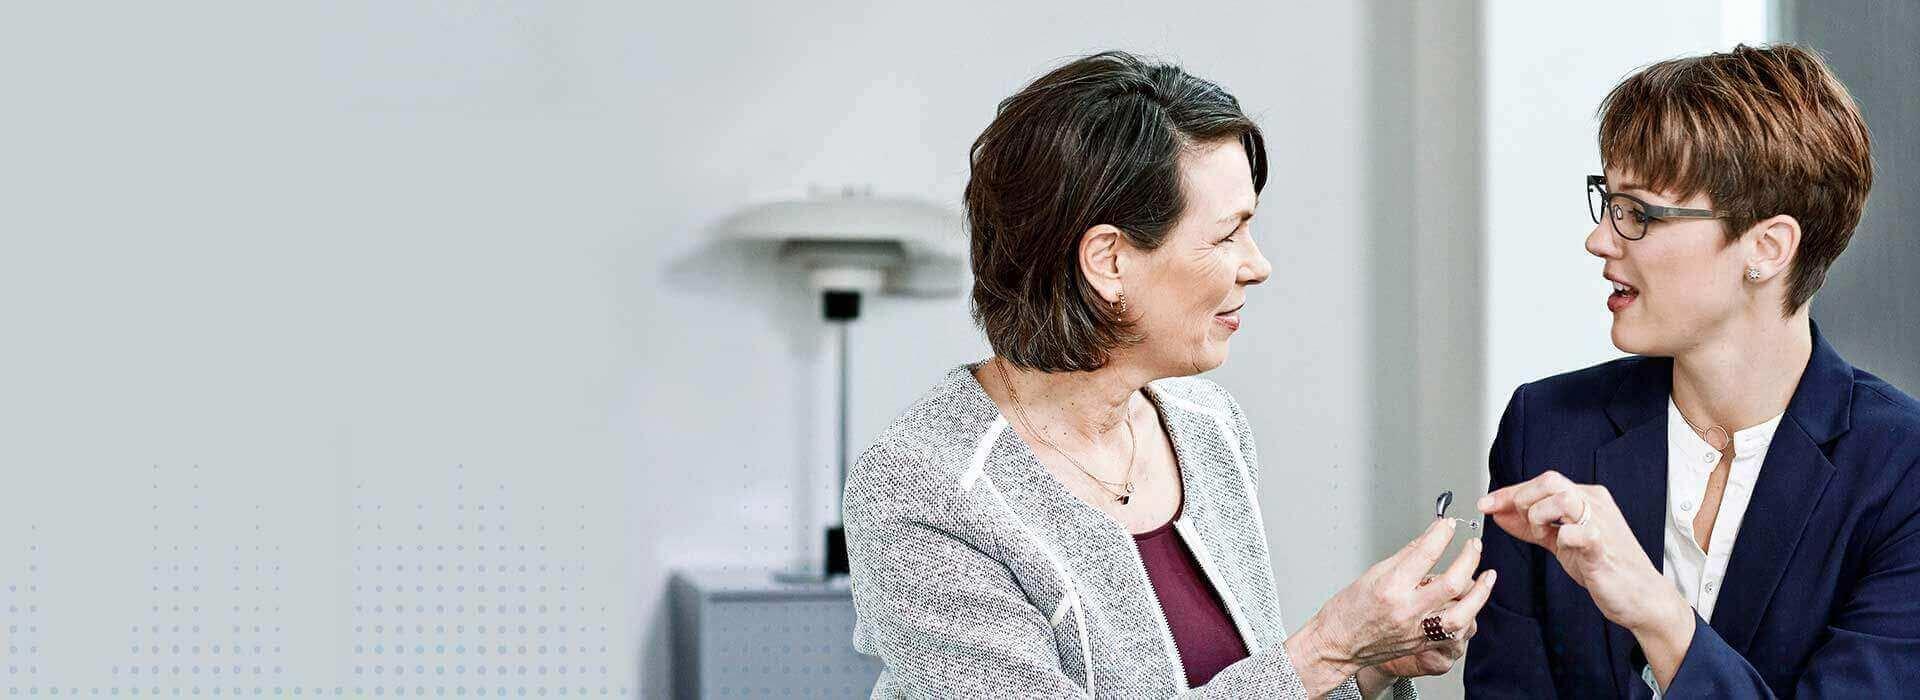 Zwei Frauen schauen sich ein Hörgerät an